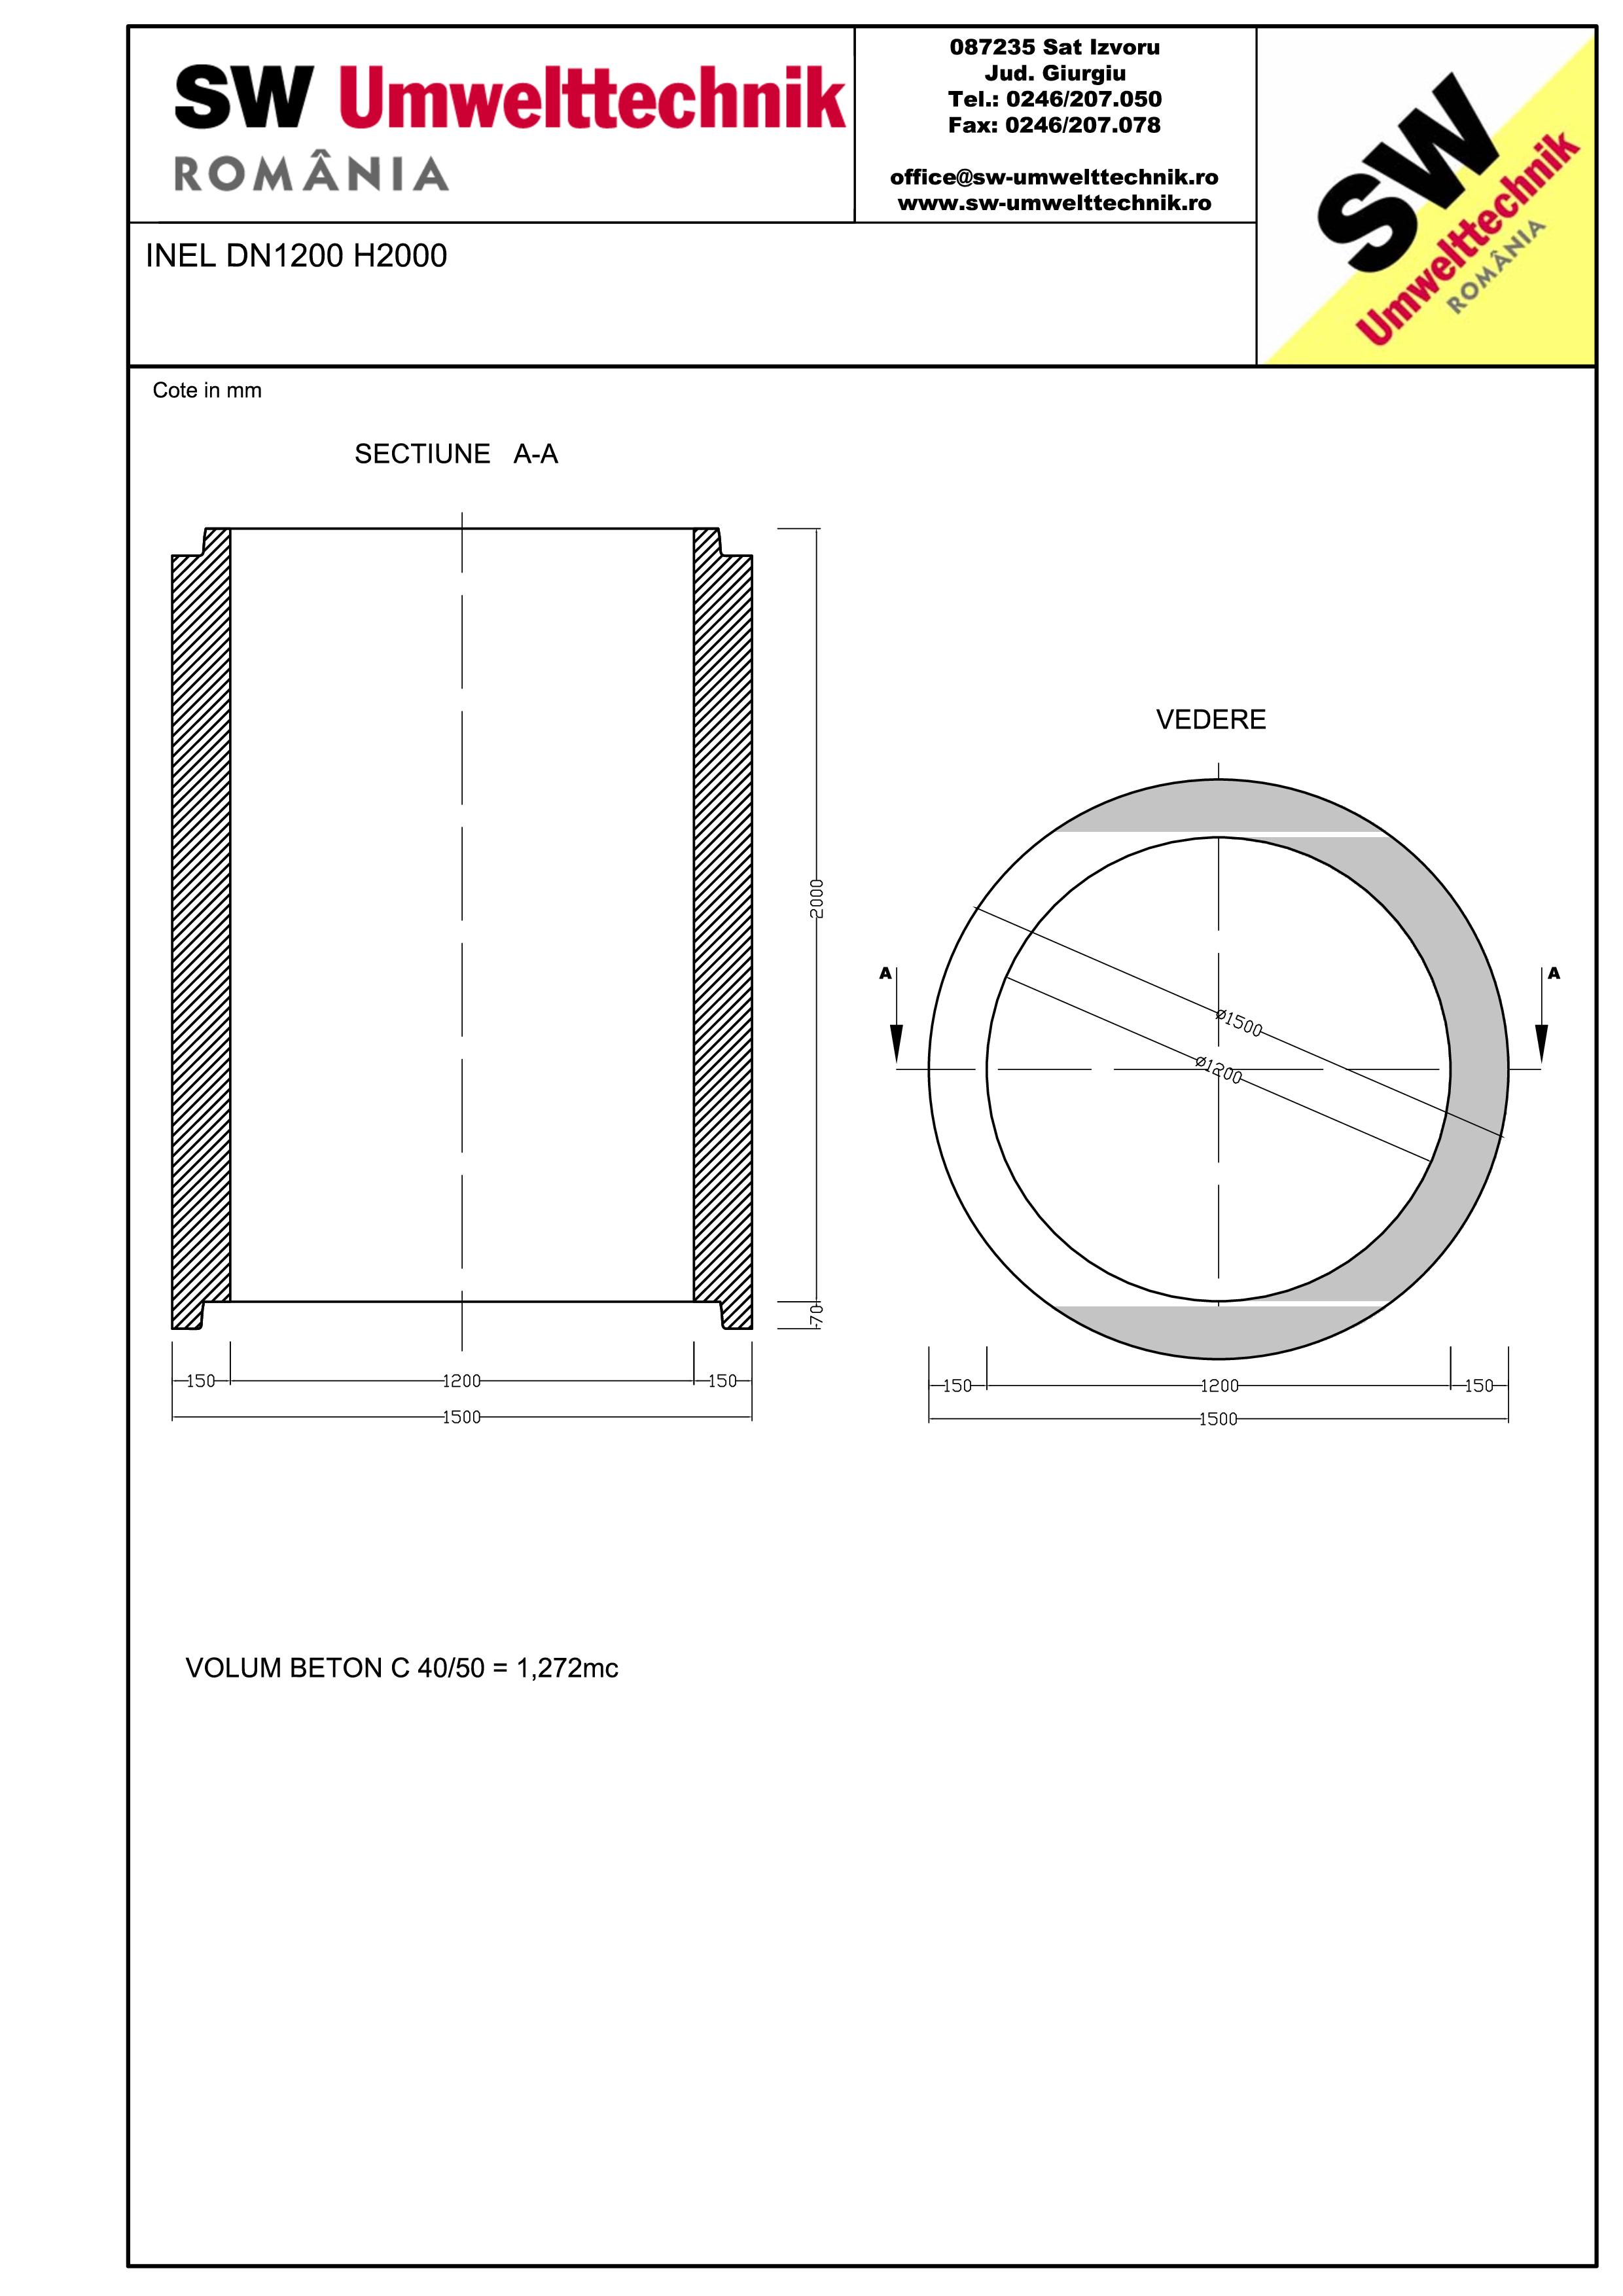 Pagina 1 - CAD-PDF Inel DN1200 INEL H2000 SW UMWELTTECHNIK Detaliu de produs